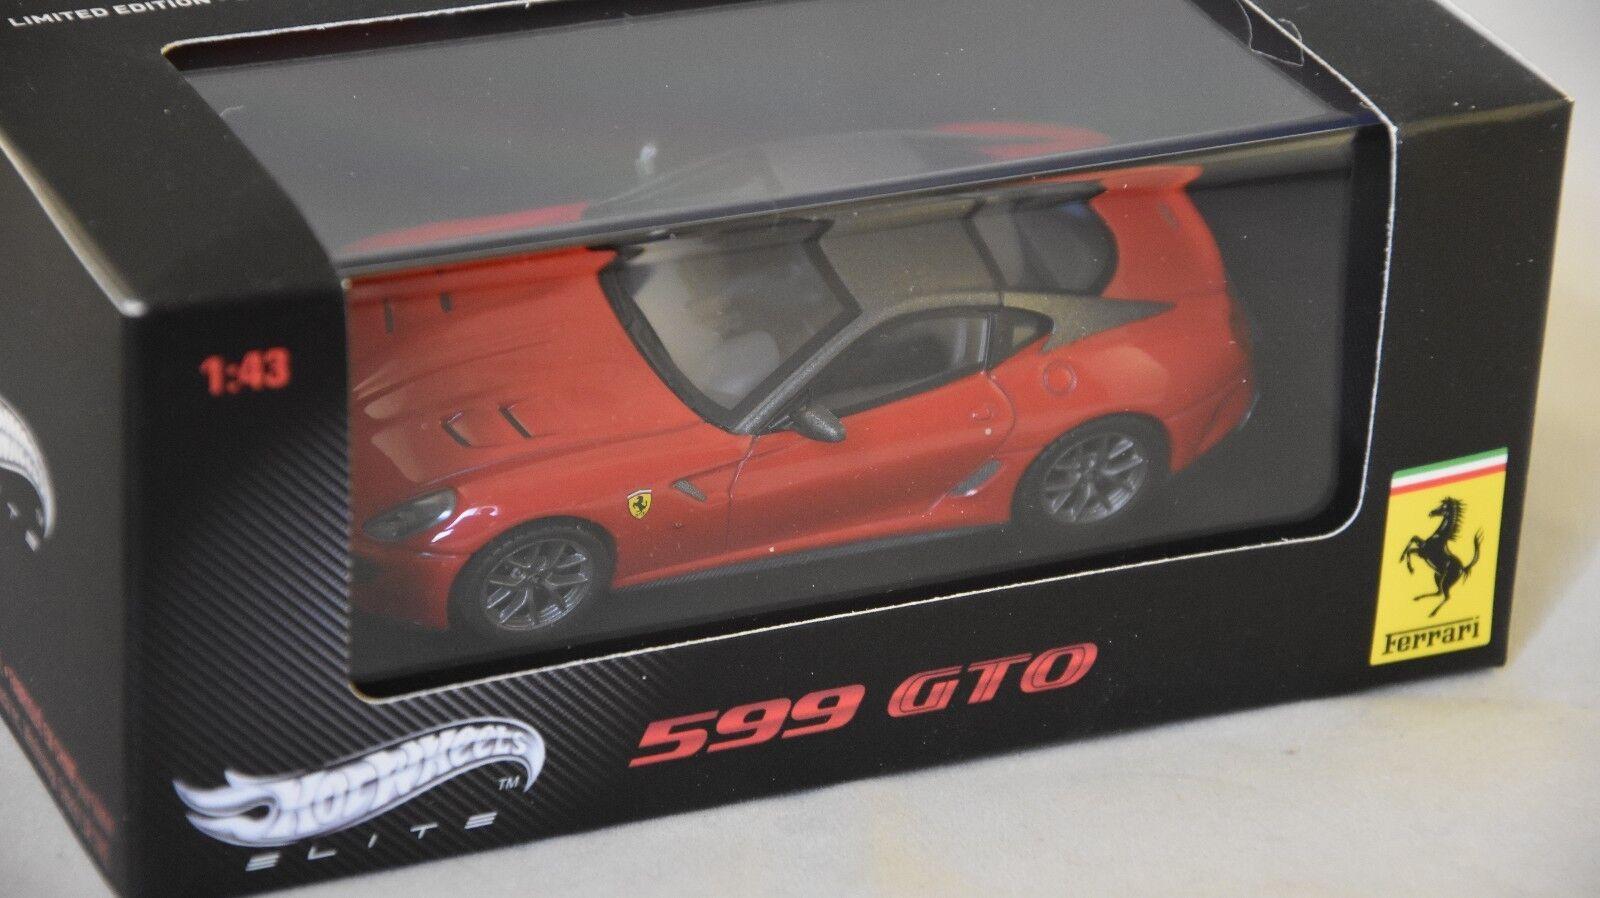 Elite wt6267-ferrari 599 gto red 2010 1 43